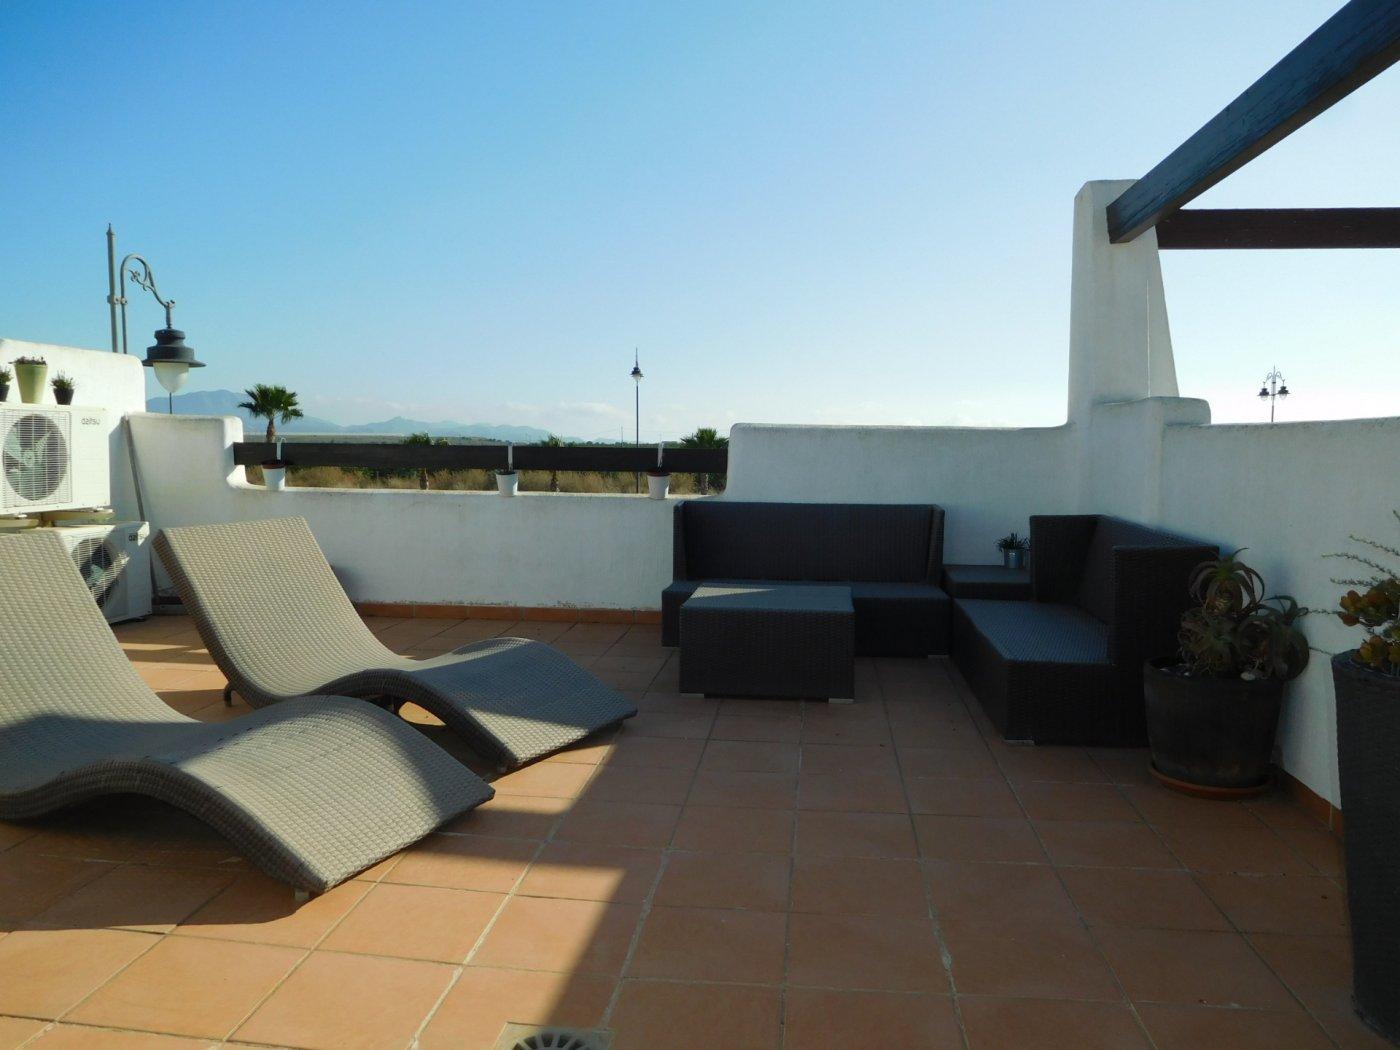 Gallery Image 14 of Apartment For rent in Condado De Alhama, Alhama De Murcia With Pool